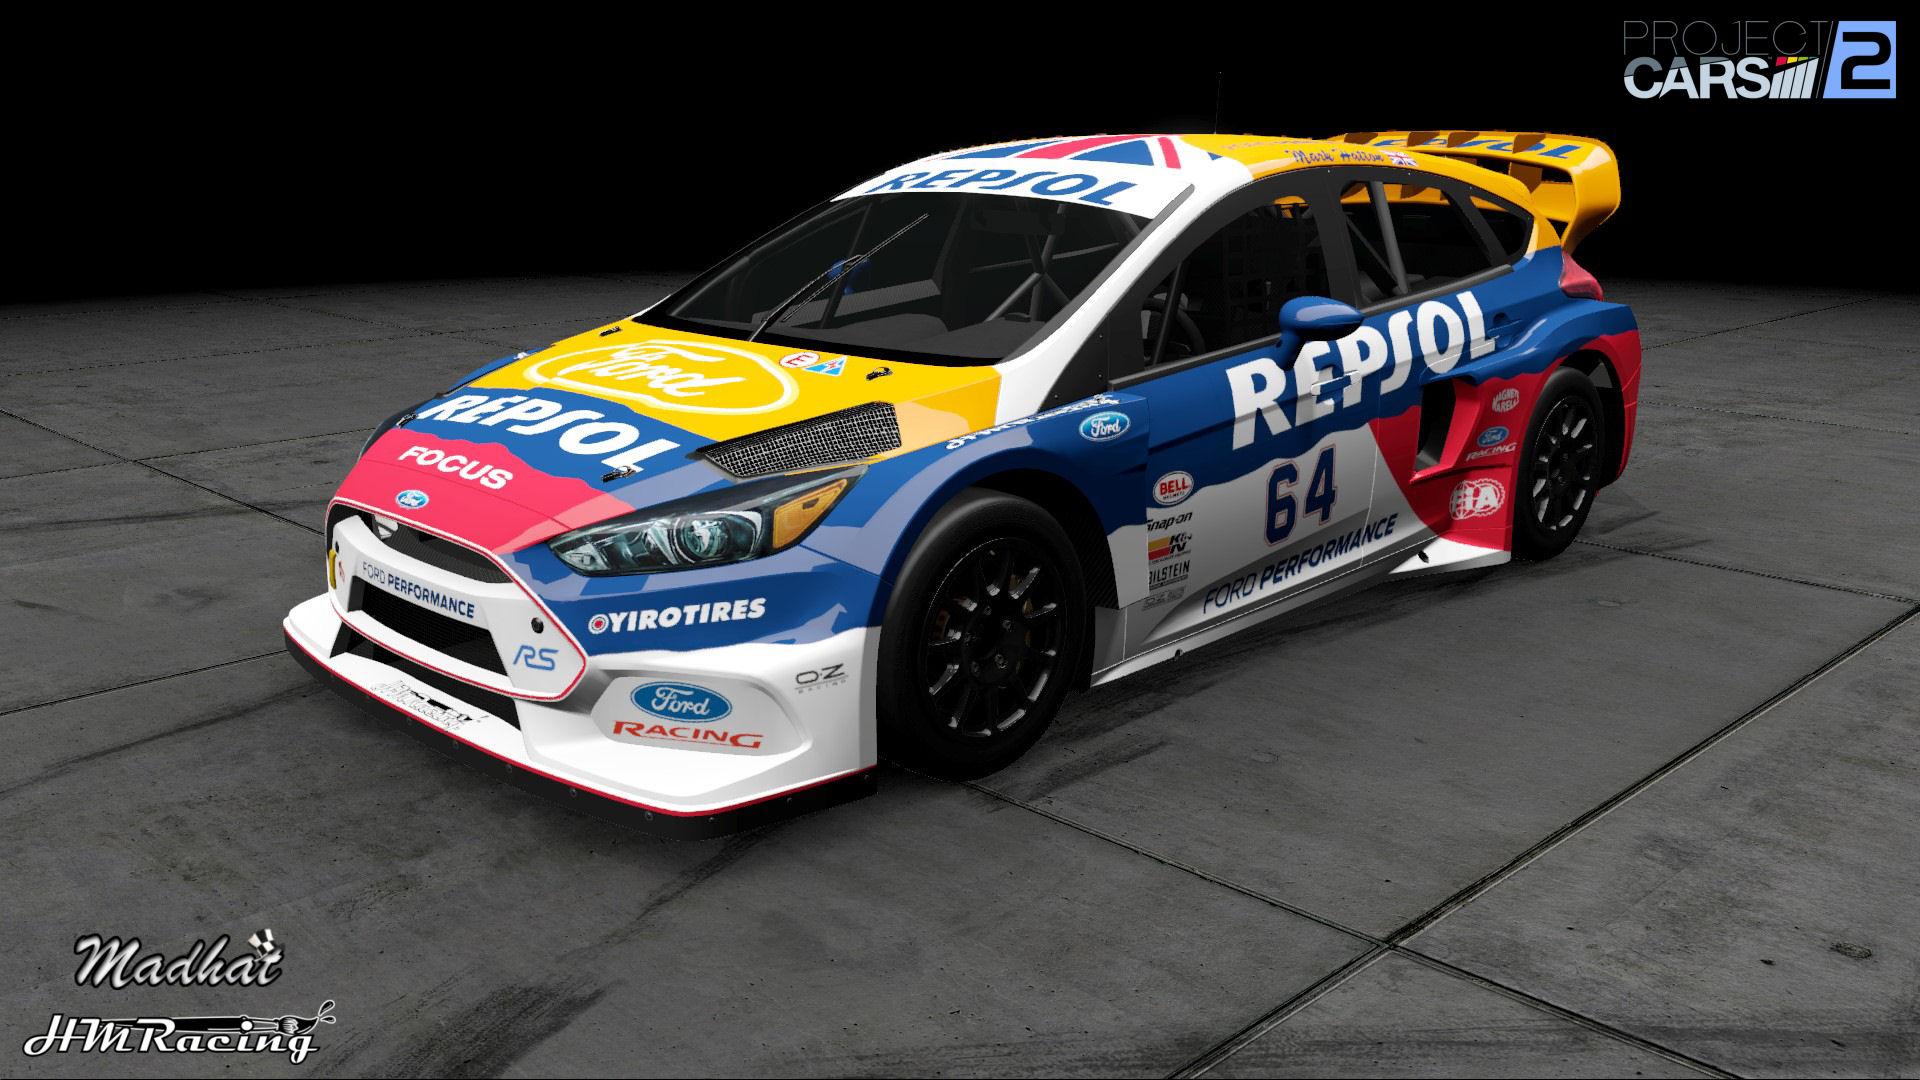 Repsol Ford Focus RX 01.jpg